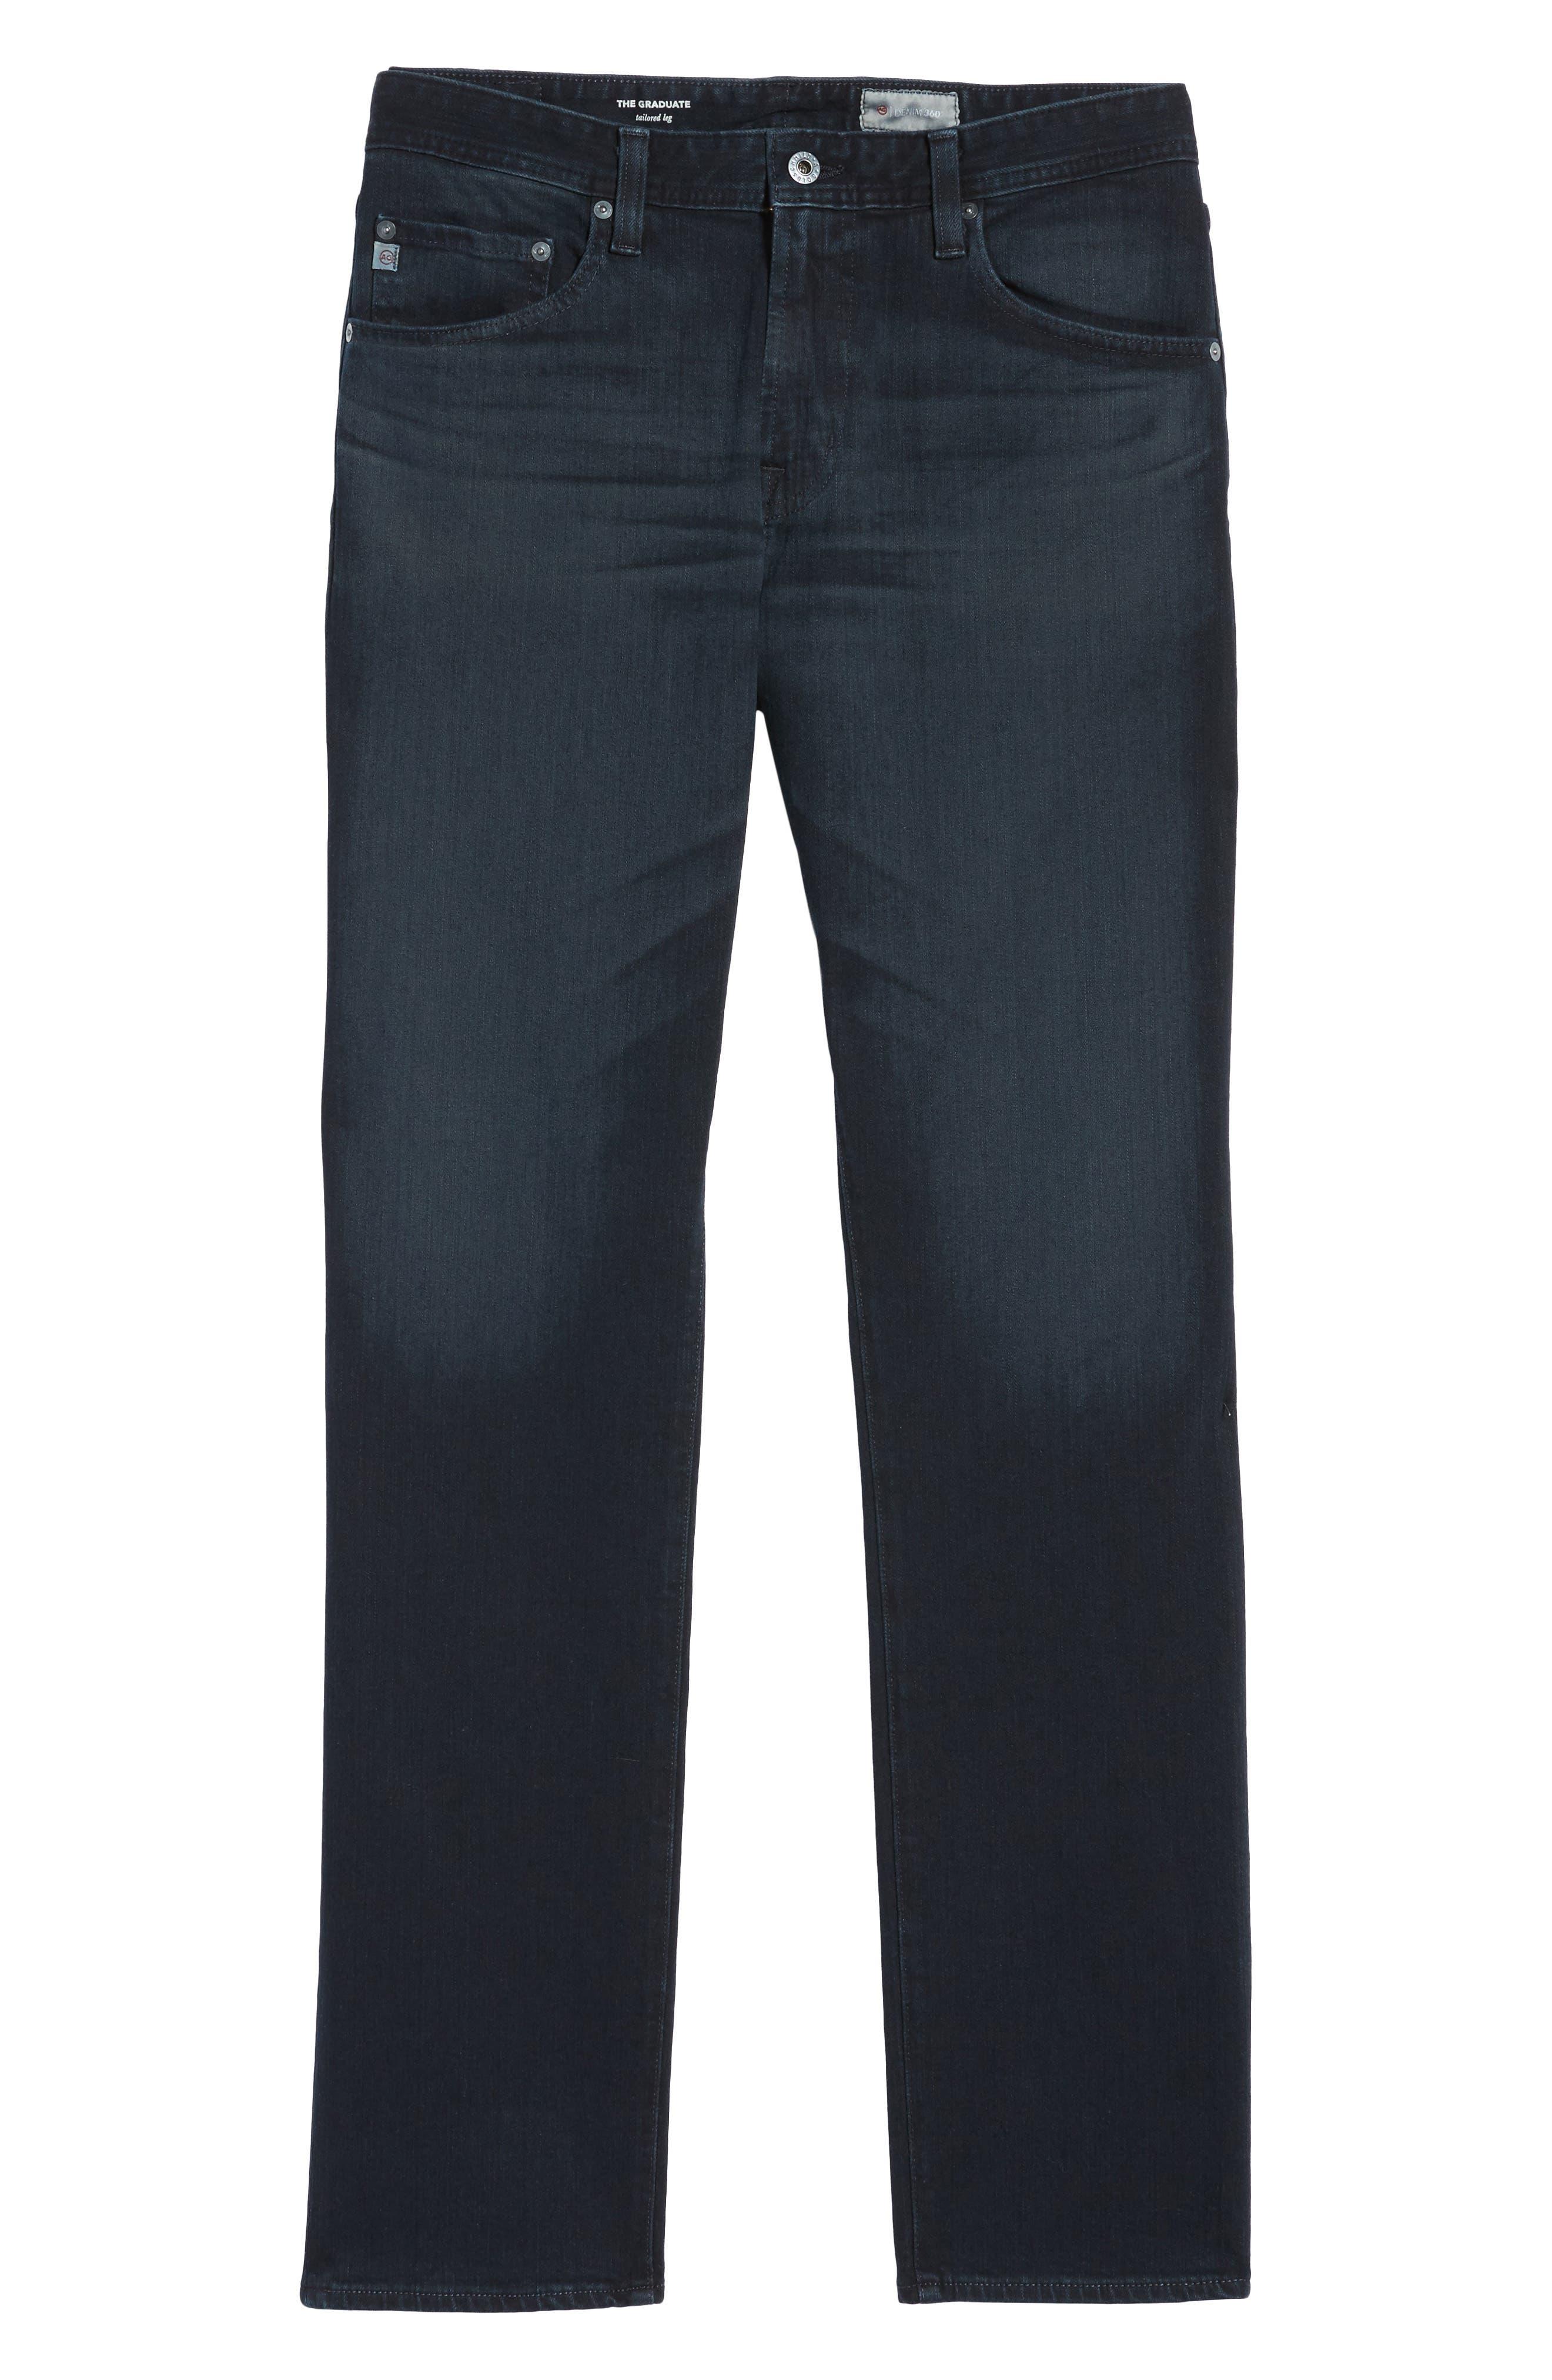 Graduate Slim Straight Leg Jeans,                             Alternate thumbnail 2, color,                             BUNDLED